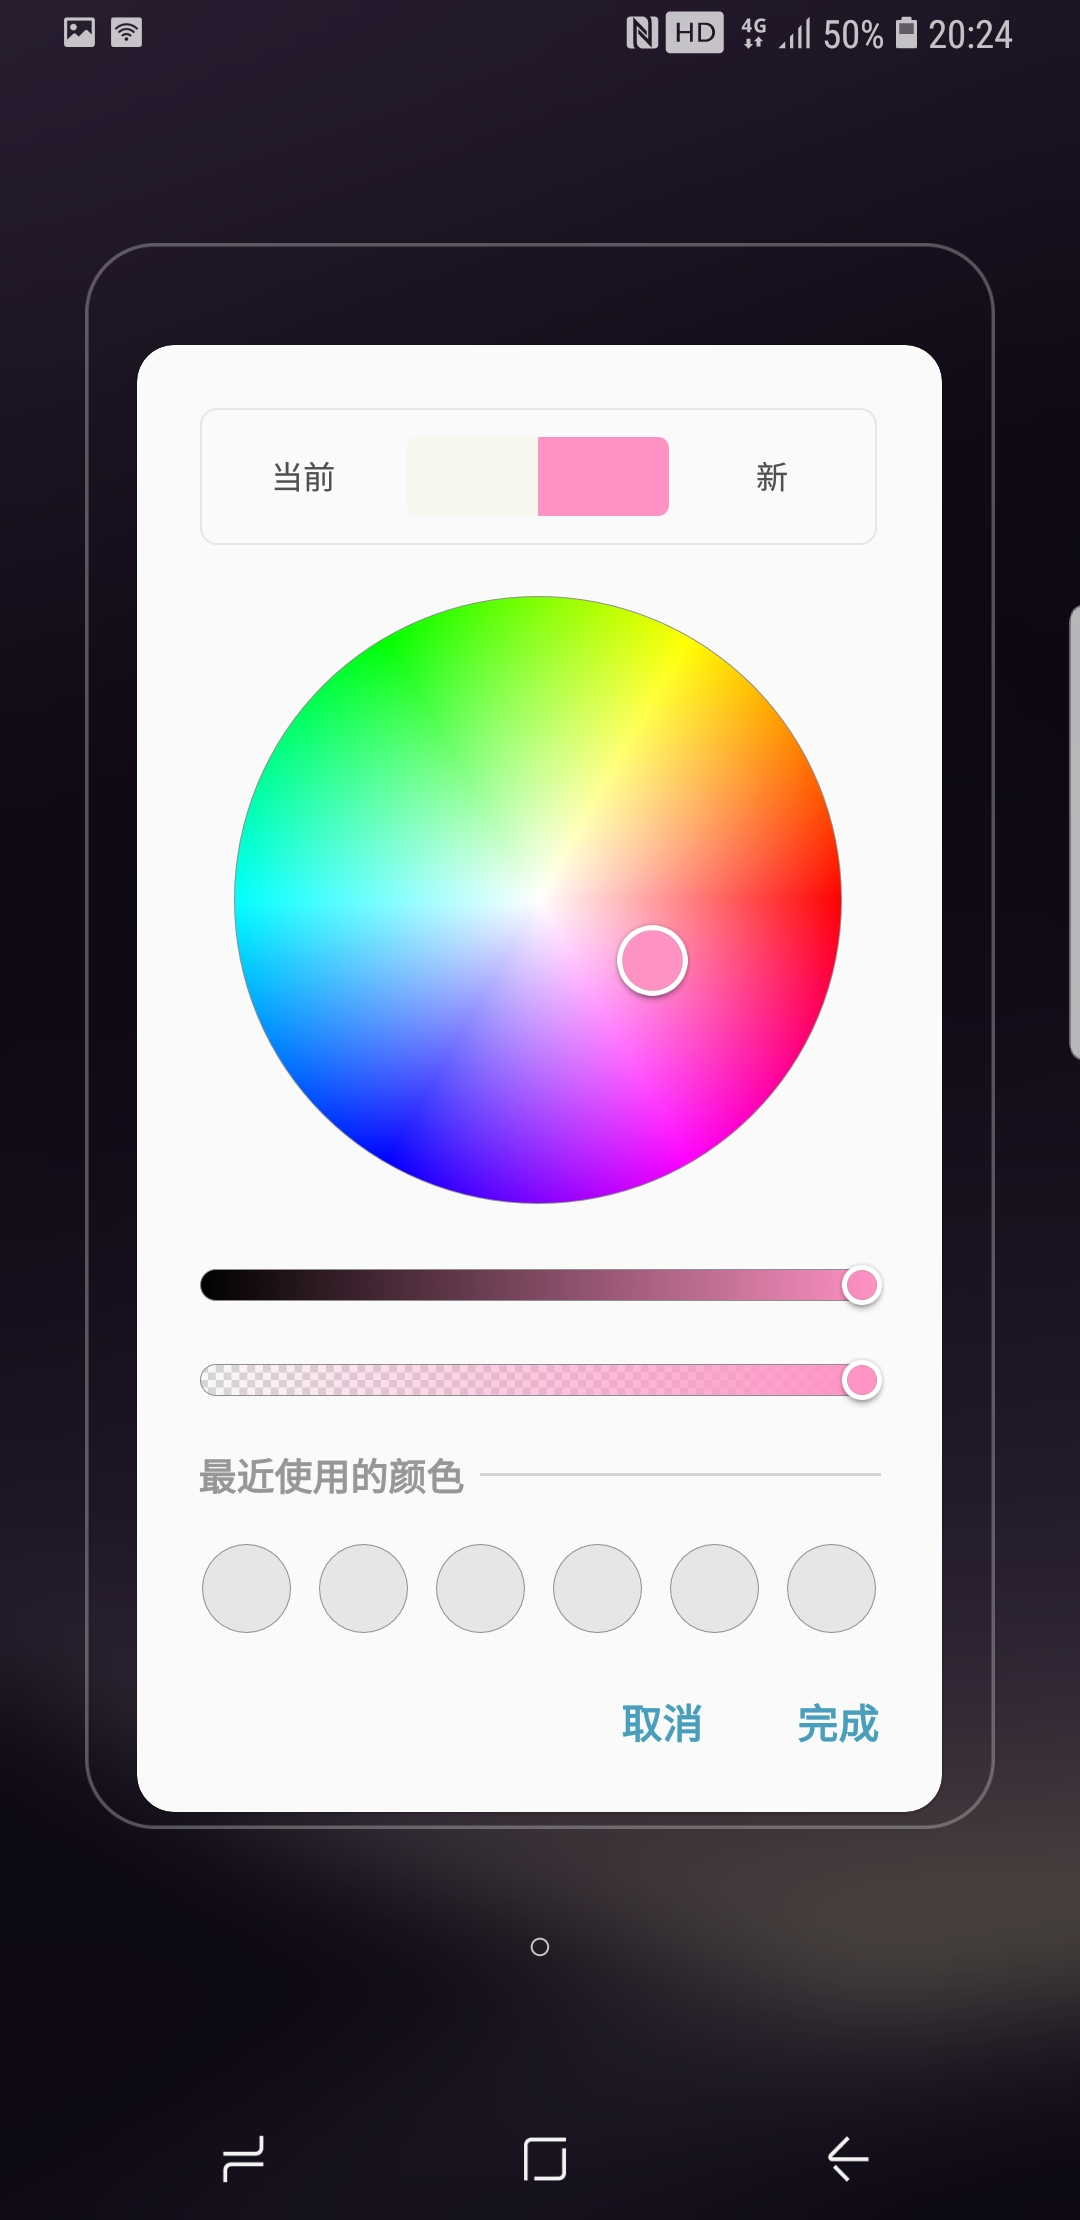 Screenshot_Samsung Experience Home_20171225-20241.jpg